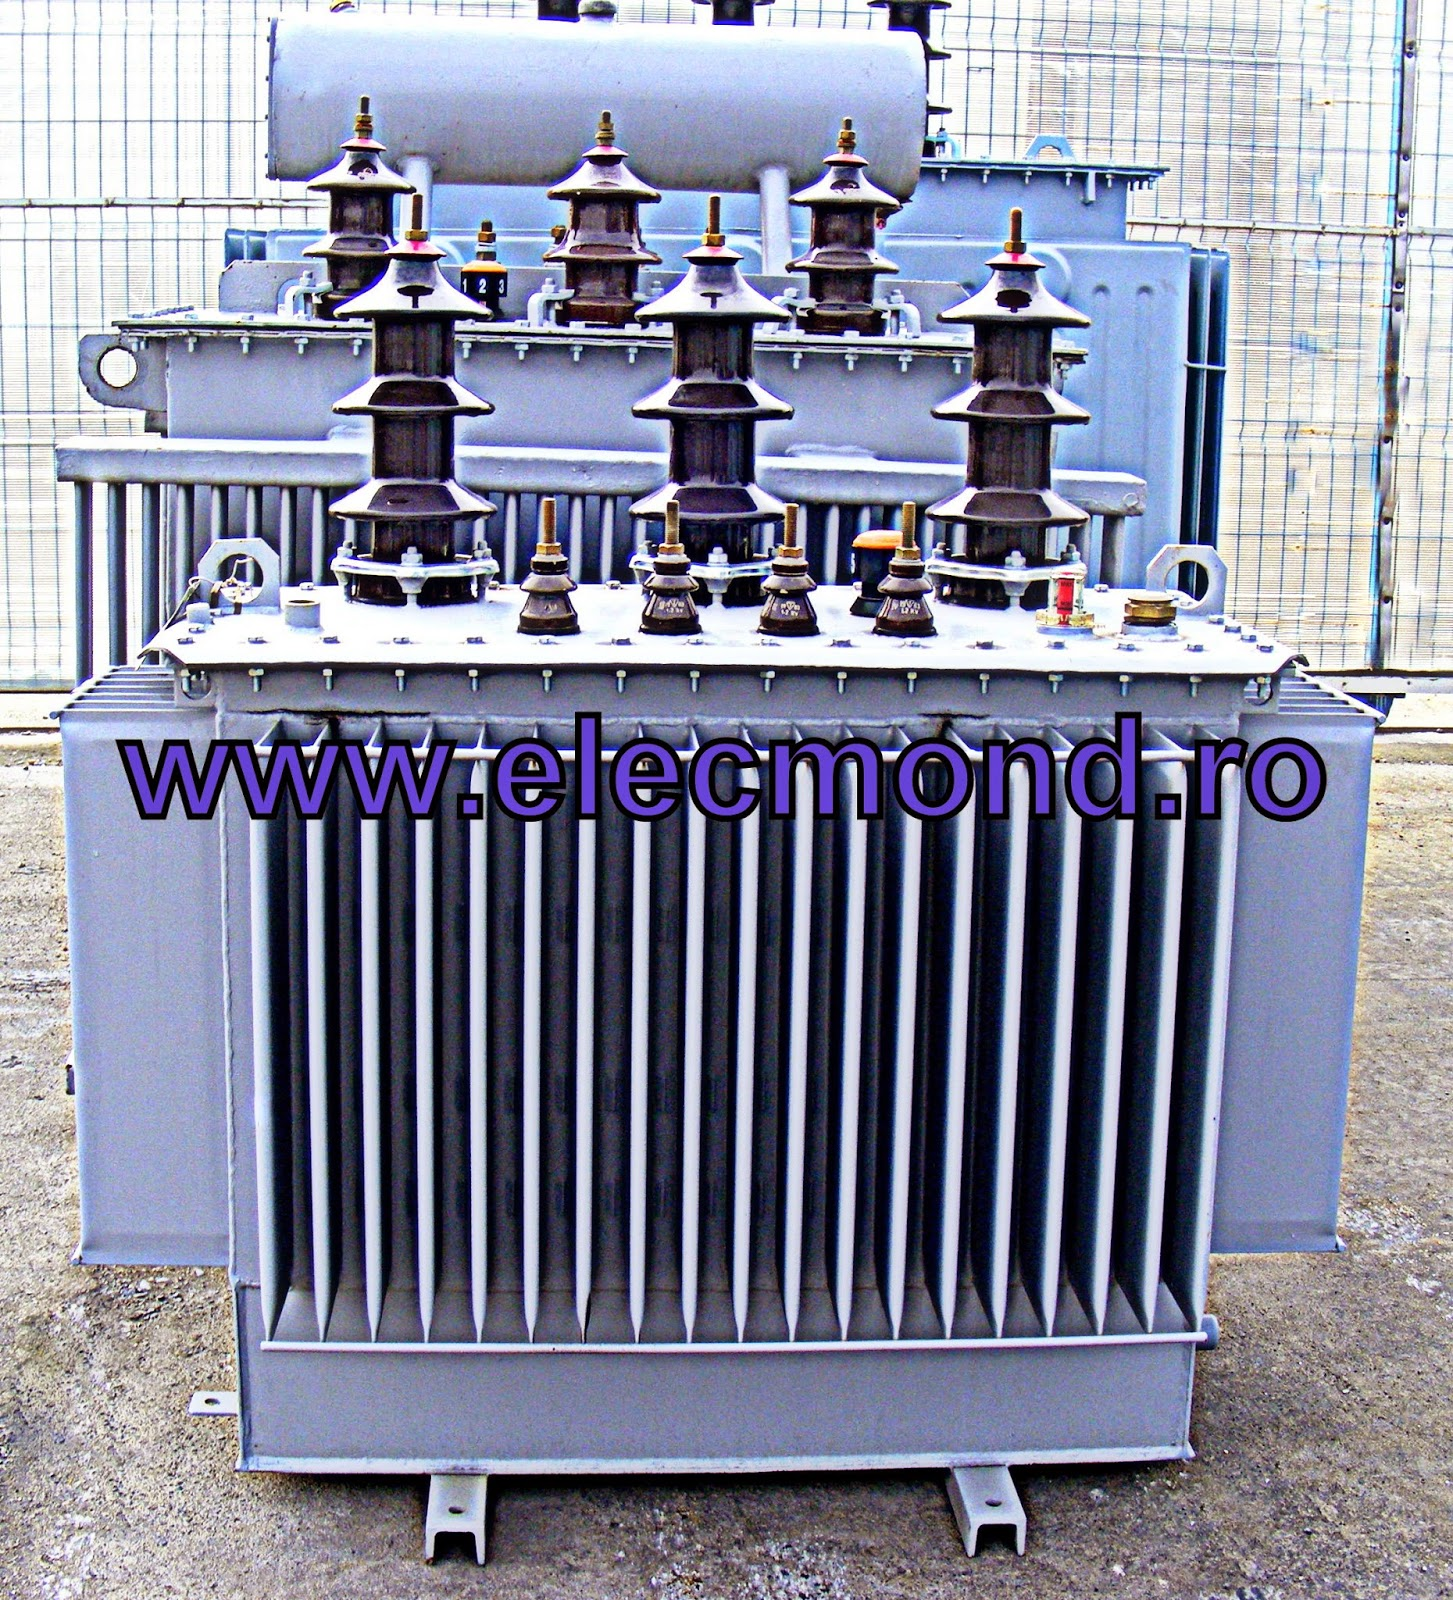 transformator , transformatoare , transformatoare din stoc , elecmond , elecmond blog , transformatoare electrice , transformatoare de putere , reparatii transformatoare , transformator 63 kVA